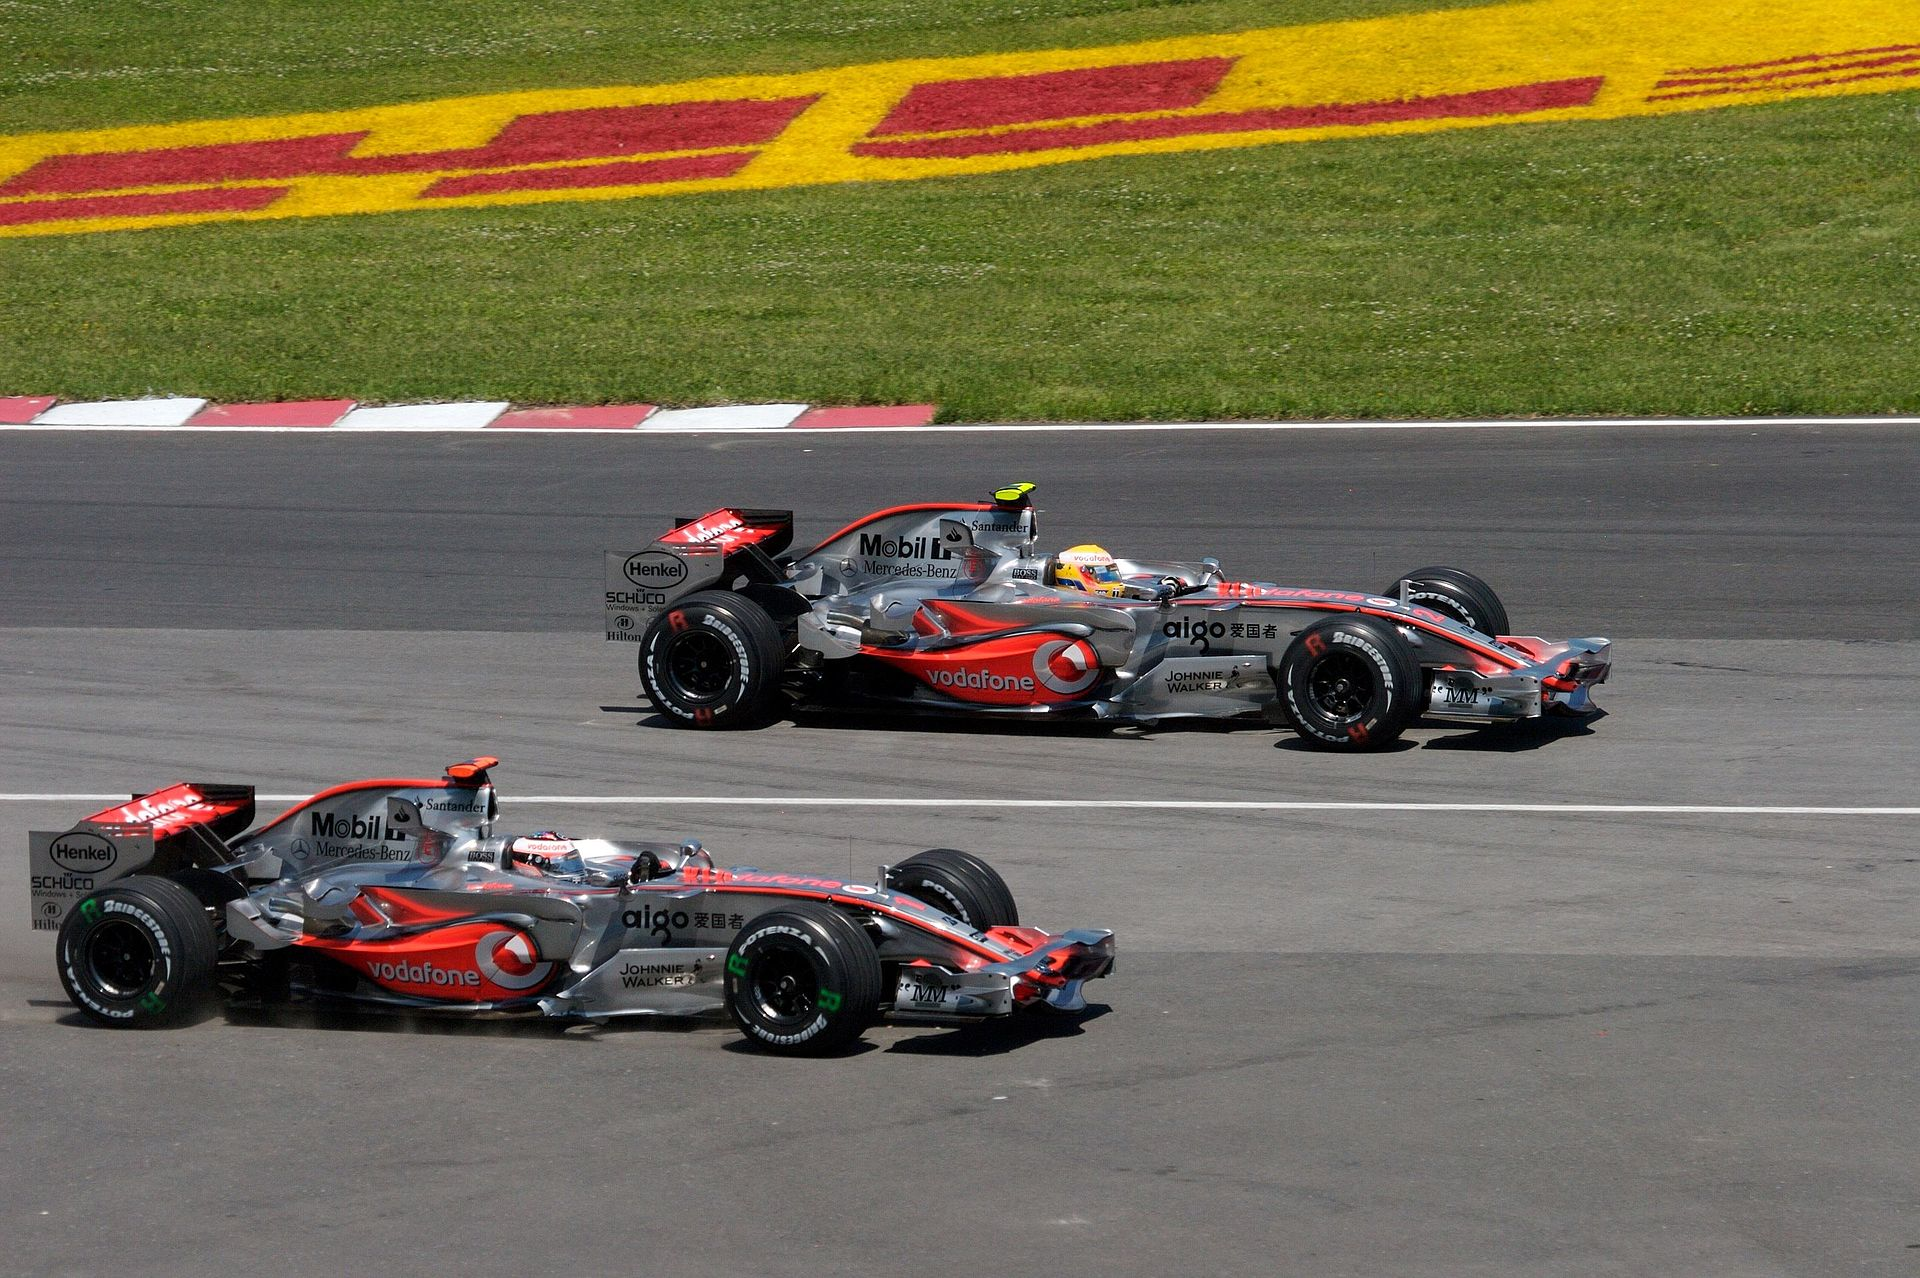 Hamilton wint in Canada terwijl Alonso fout op fout stapelt. De rivaliteit tussen de coureurs groeit, terwijl spygate begint te broeien.